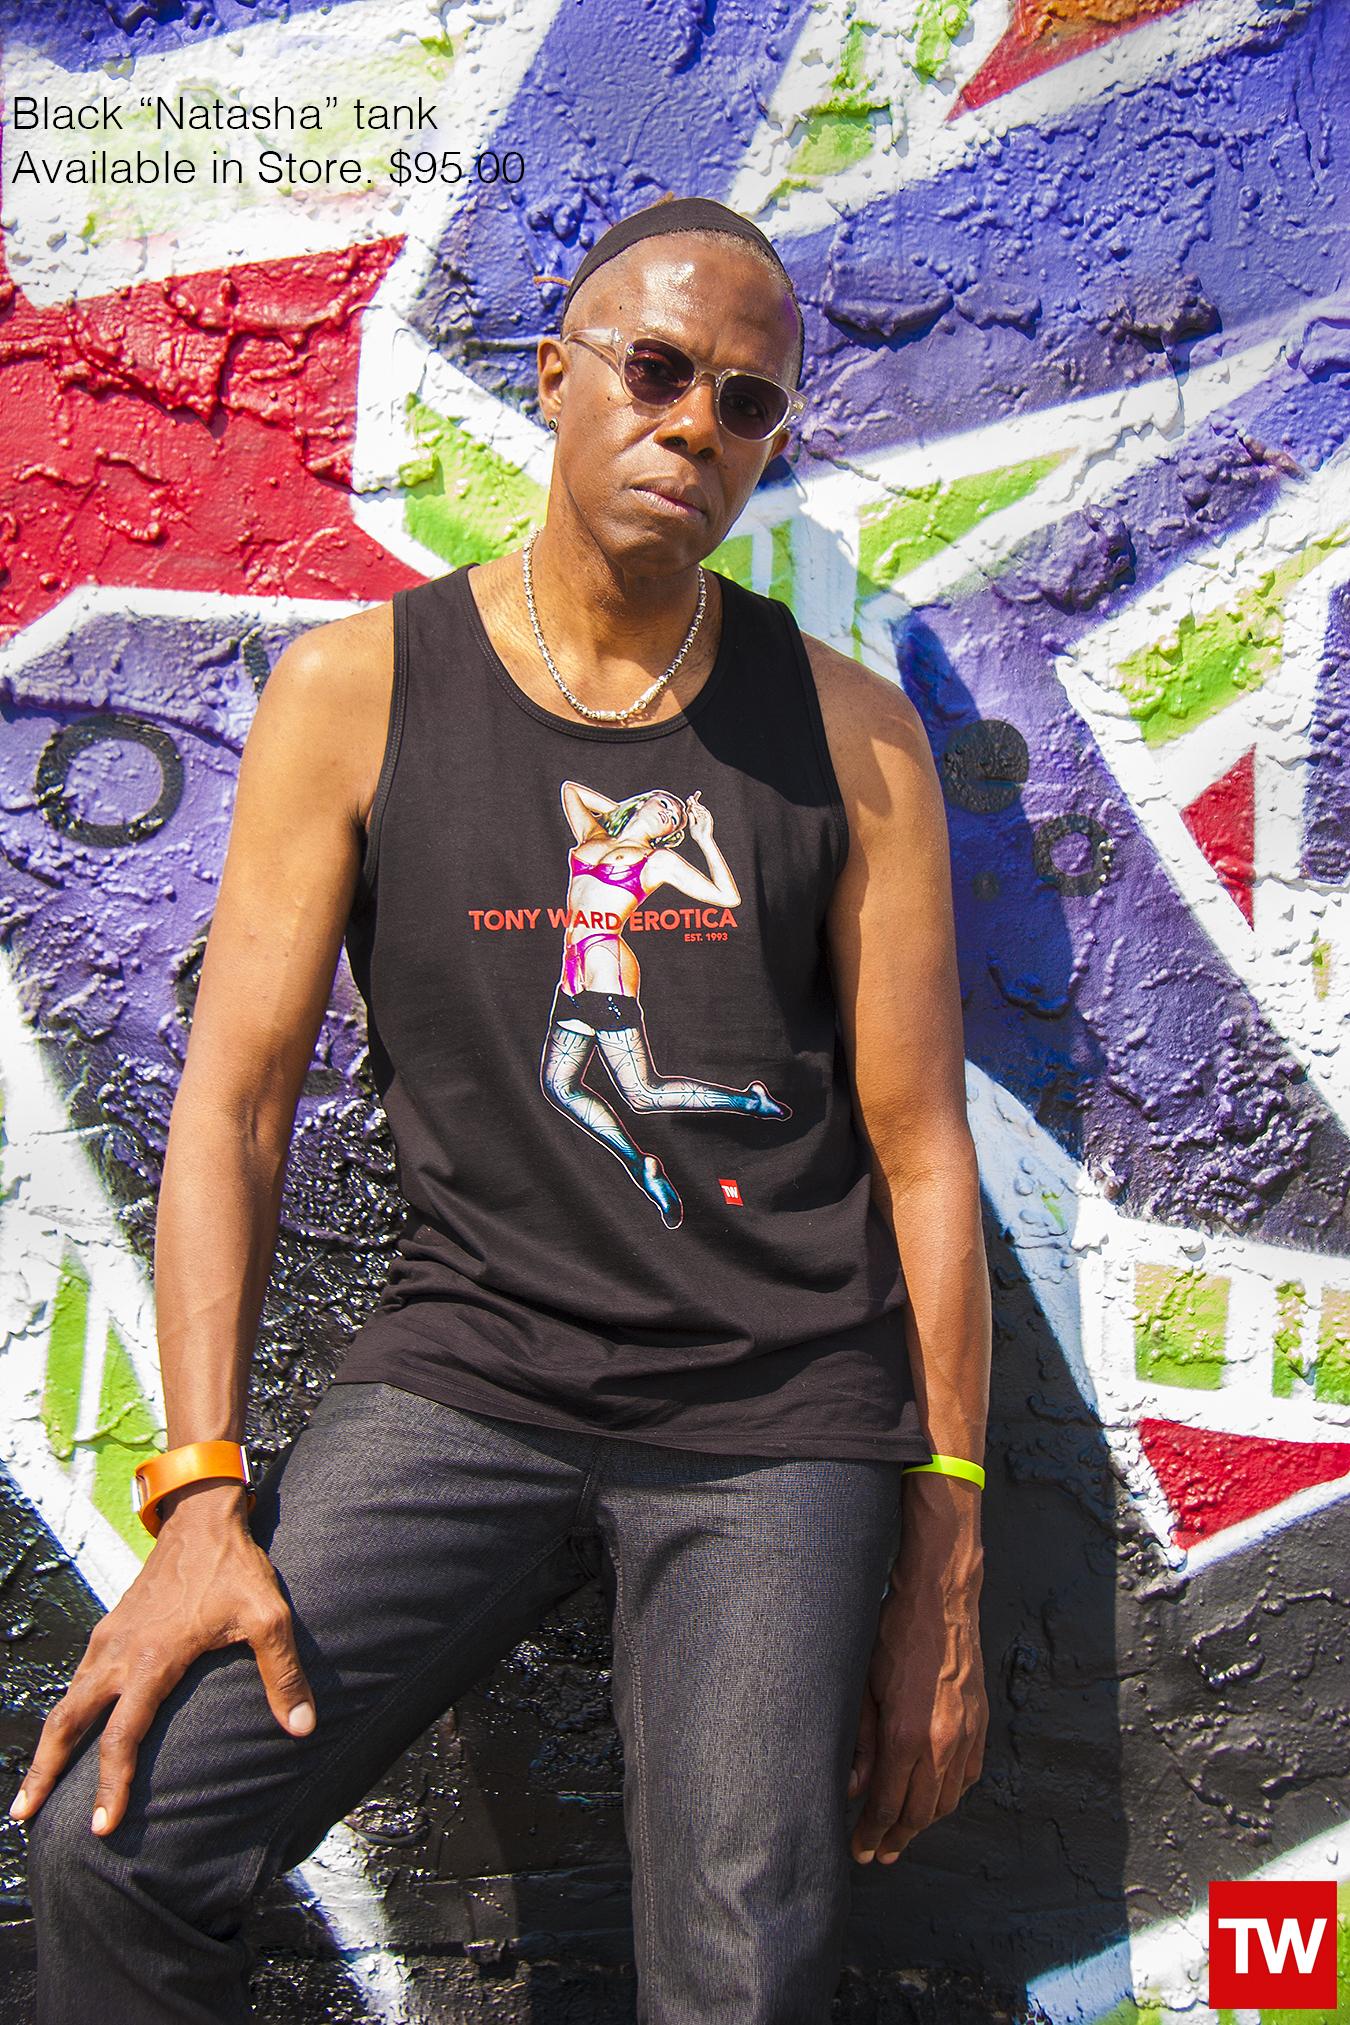 Tony_Ward_Studio_e_commerce_store_t-shirts_black_Natasha_tank_sale_model_Mikel_Elam